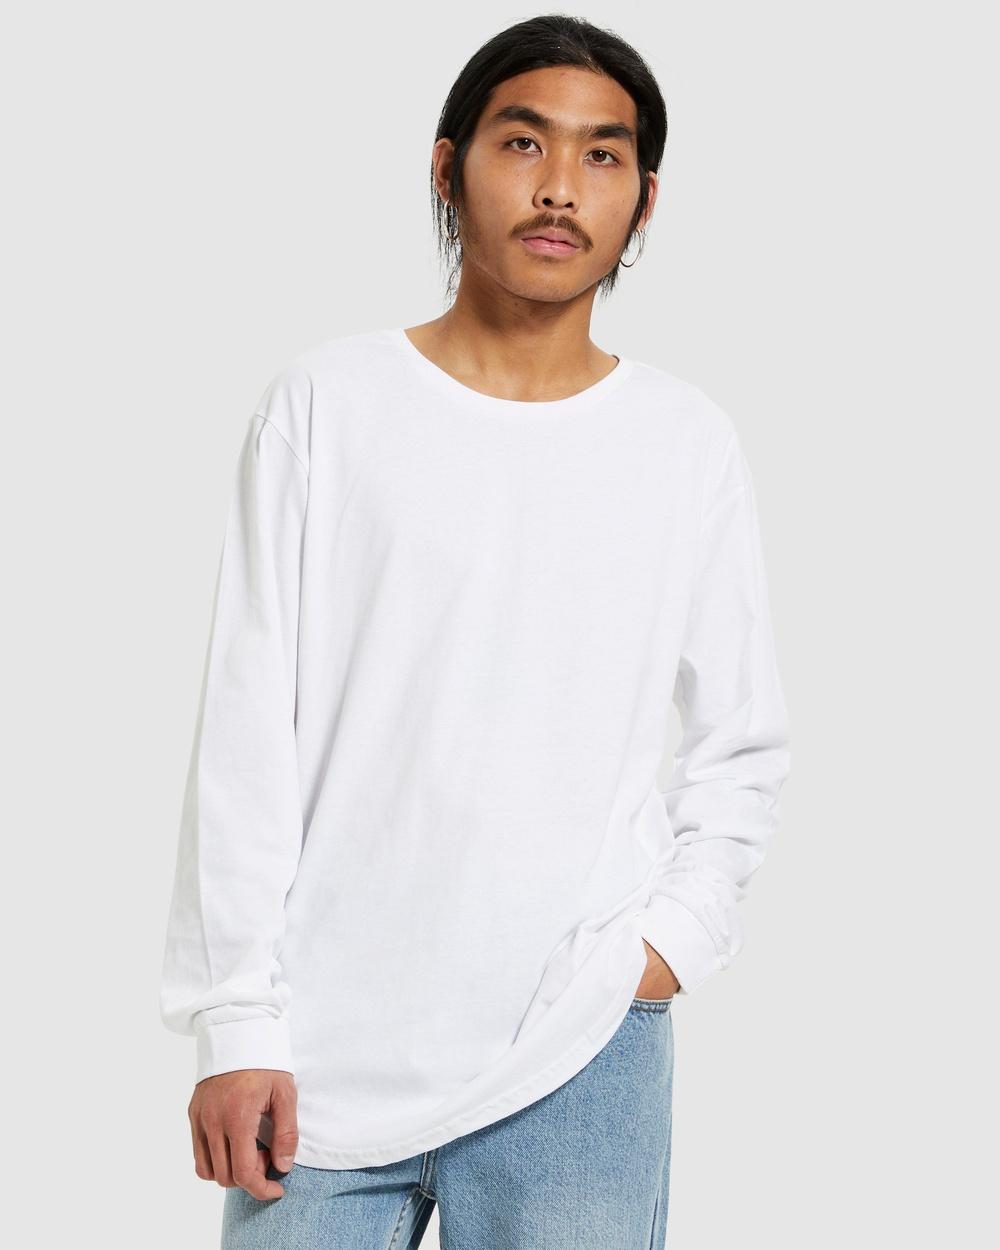 General Pants Co. Basics Long Sleeve Curved Hem T Shirt T-Shirts WHITE T-Shirt